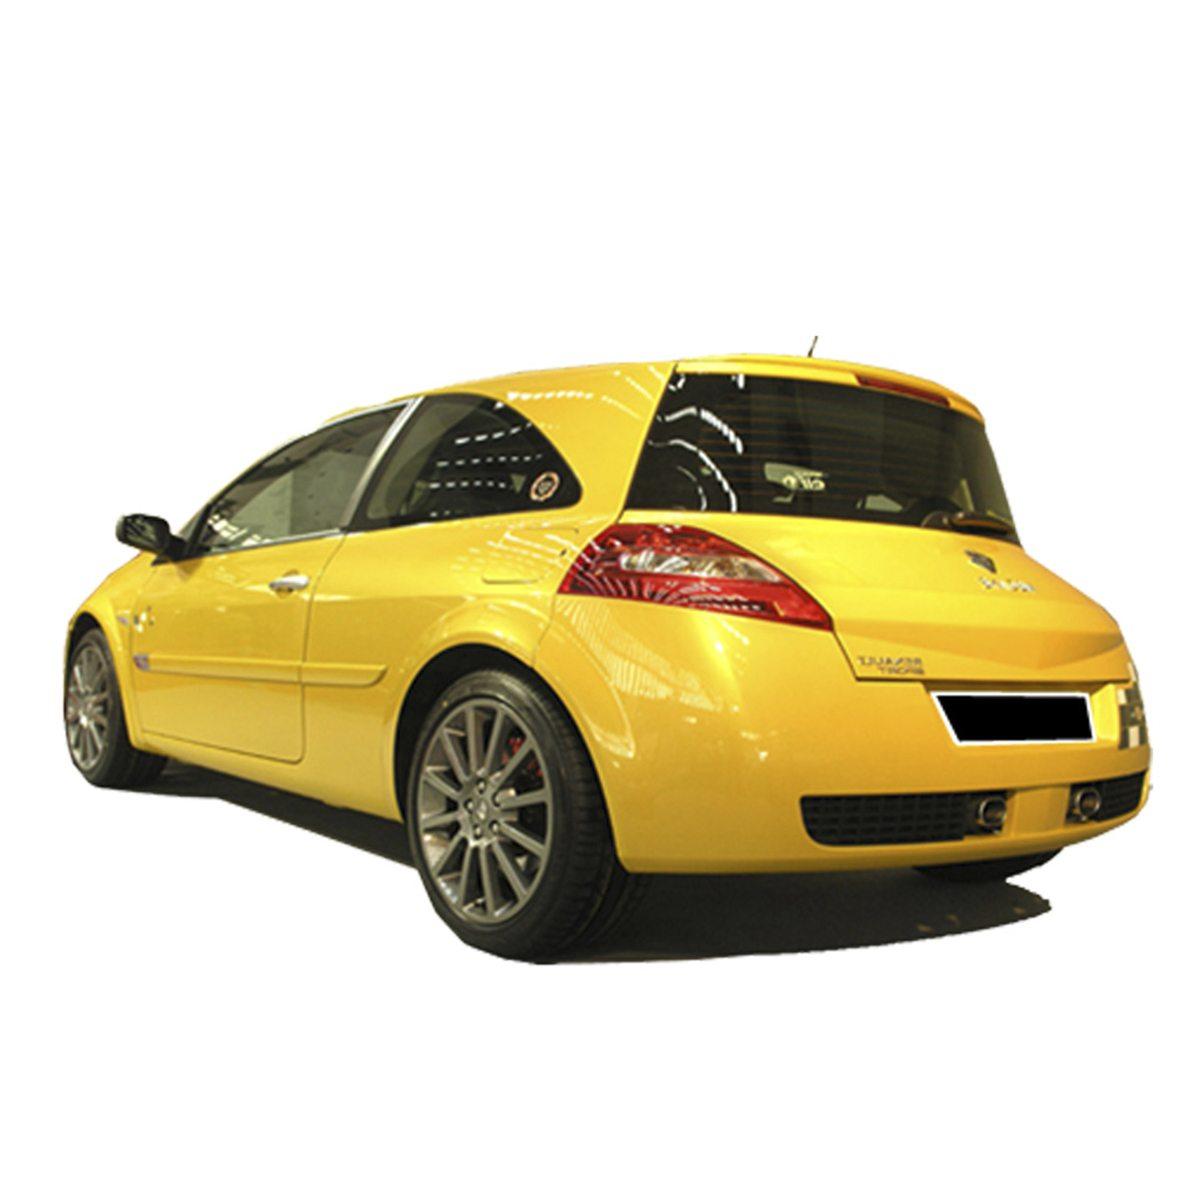 Renault-Megane-07-F1-Tras-PCU1179